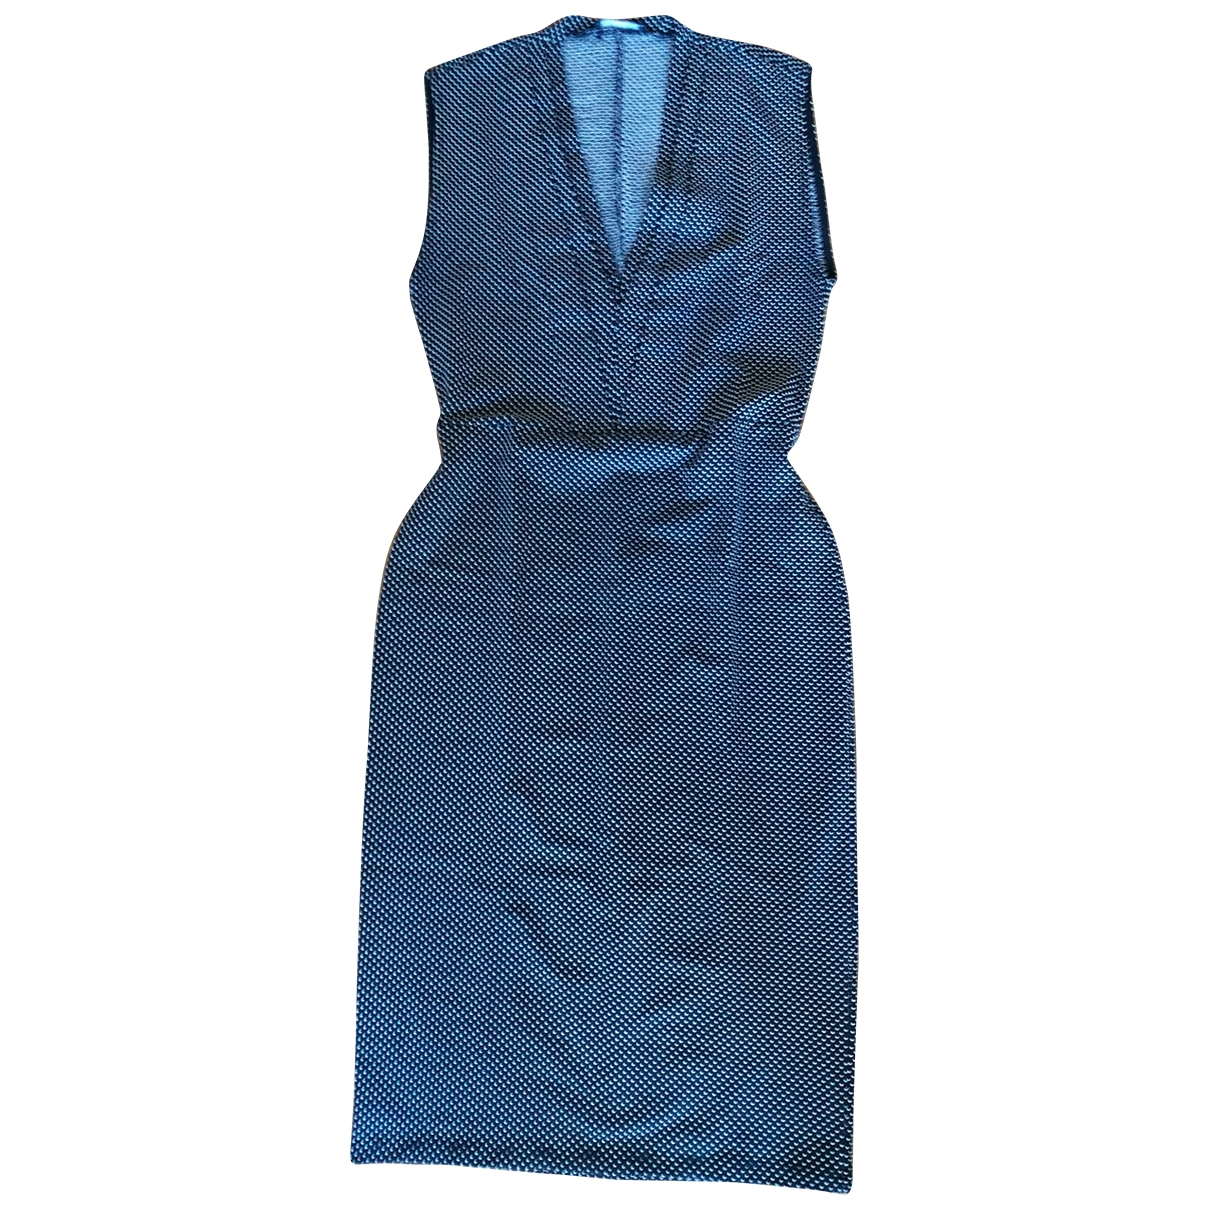 Zara - Robe   pour femme en coton - elasthane - gris